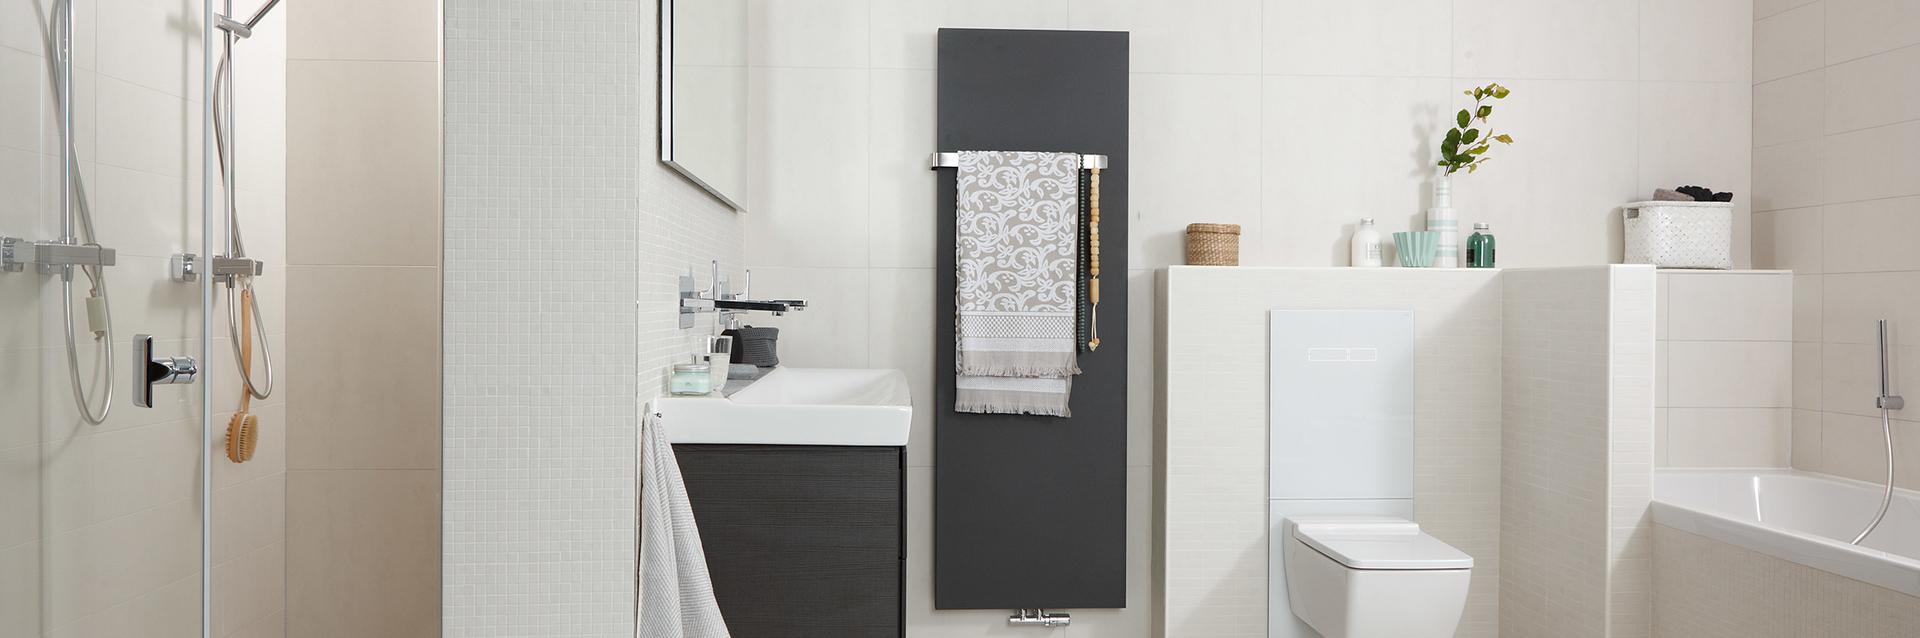 Tijdloze witte badkamer - Tijdloze witte badkamer